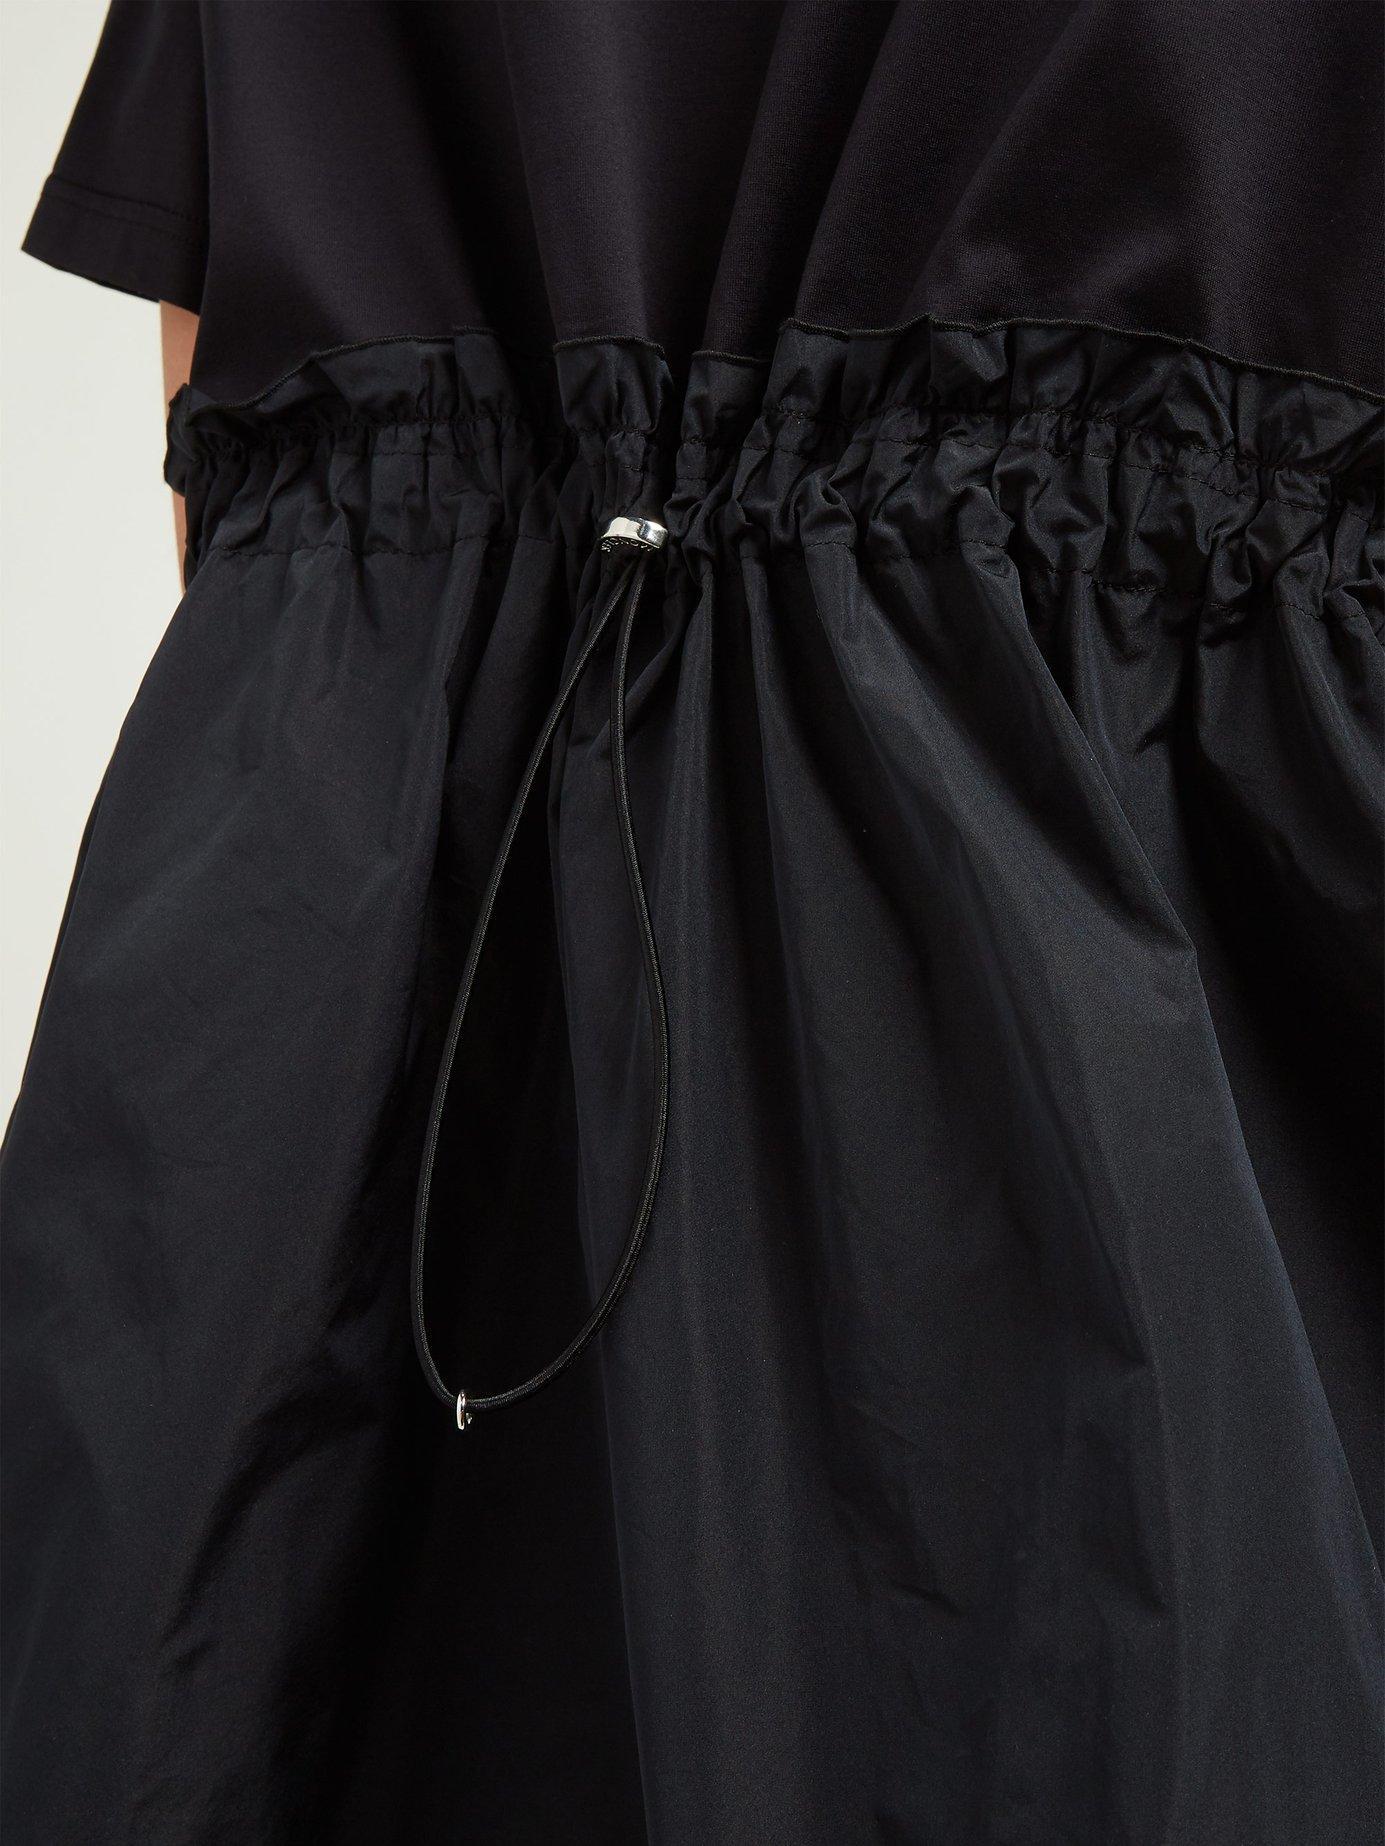 52b0ba3c65f6 Moncler - Black Abito Round Neck Cotton Jersey Dress - Lyst. View fullscreen